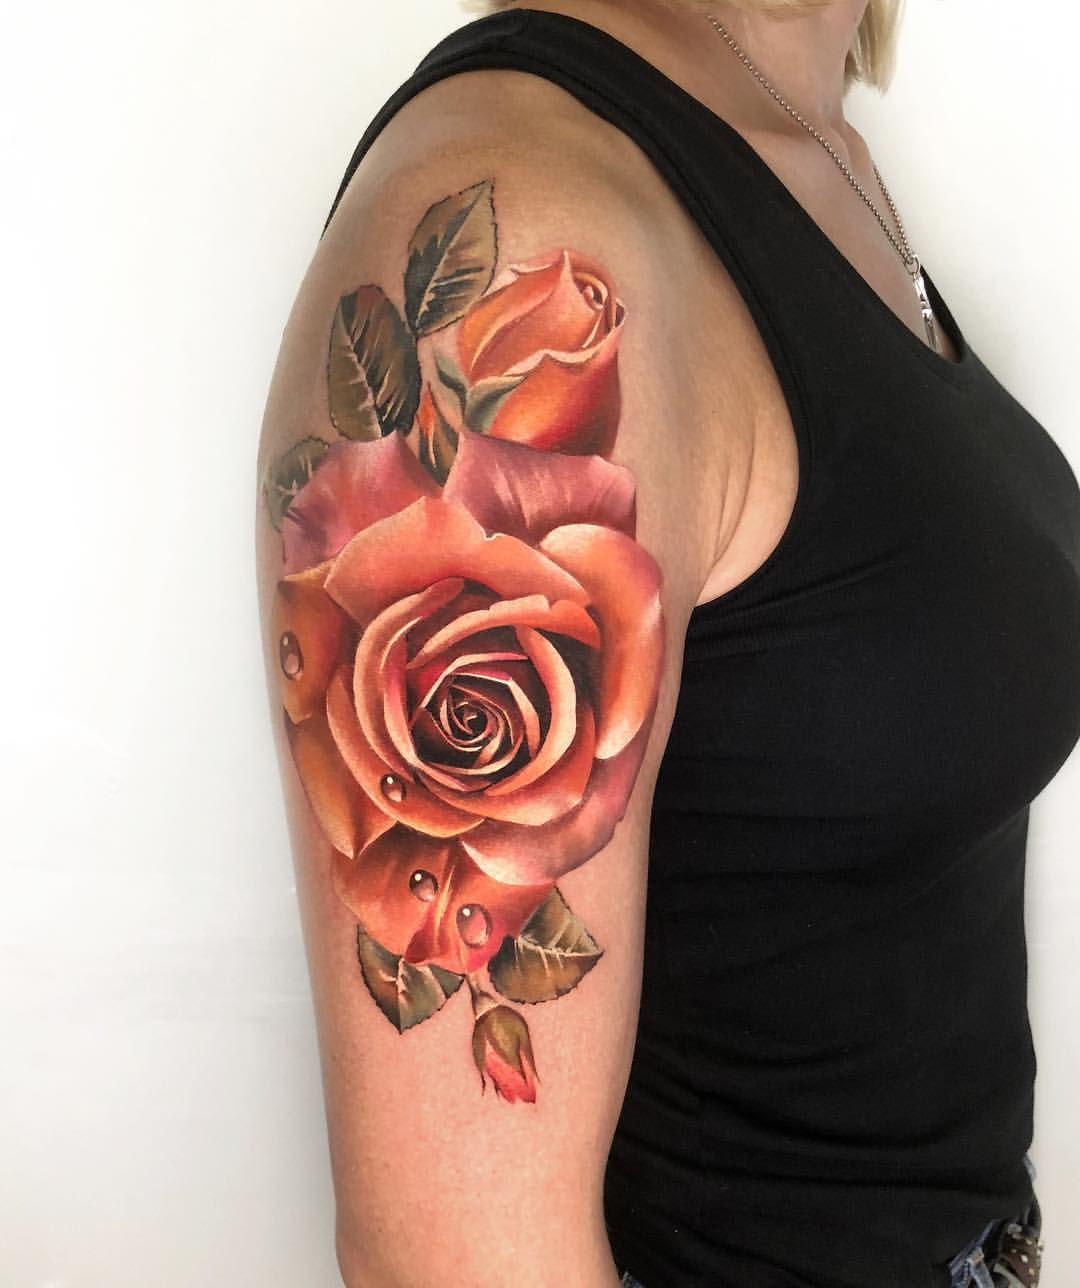 Antonina Troshina Rostra Instagram Posts Videos Stories Picoji Colors Of Autumn Ros Colorful Rose Tattoos Rose Tattoos Coloured Rose Tattoo